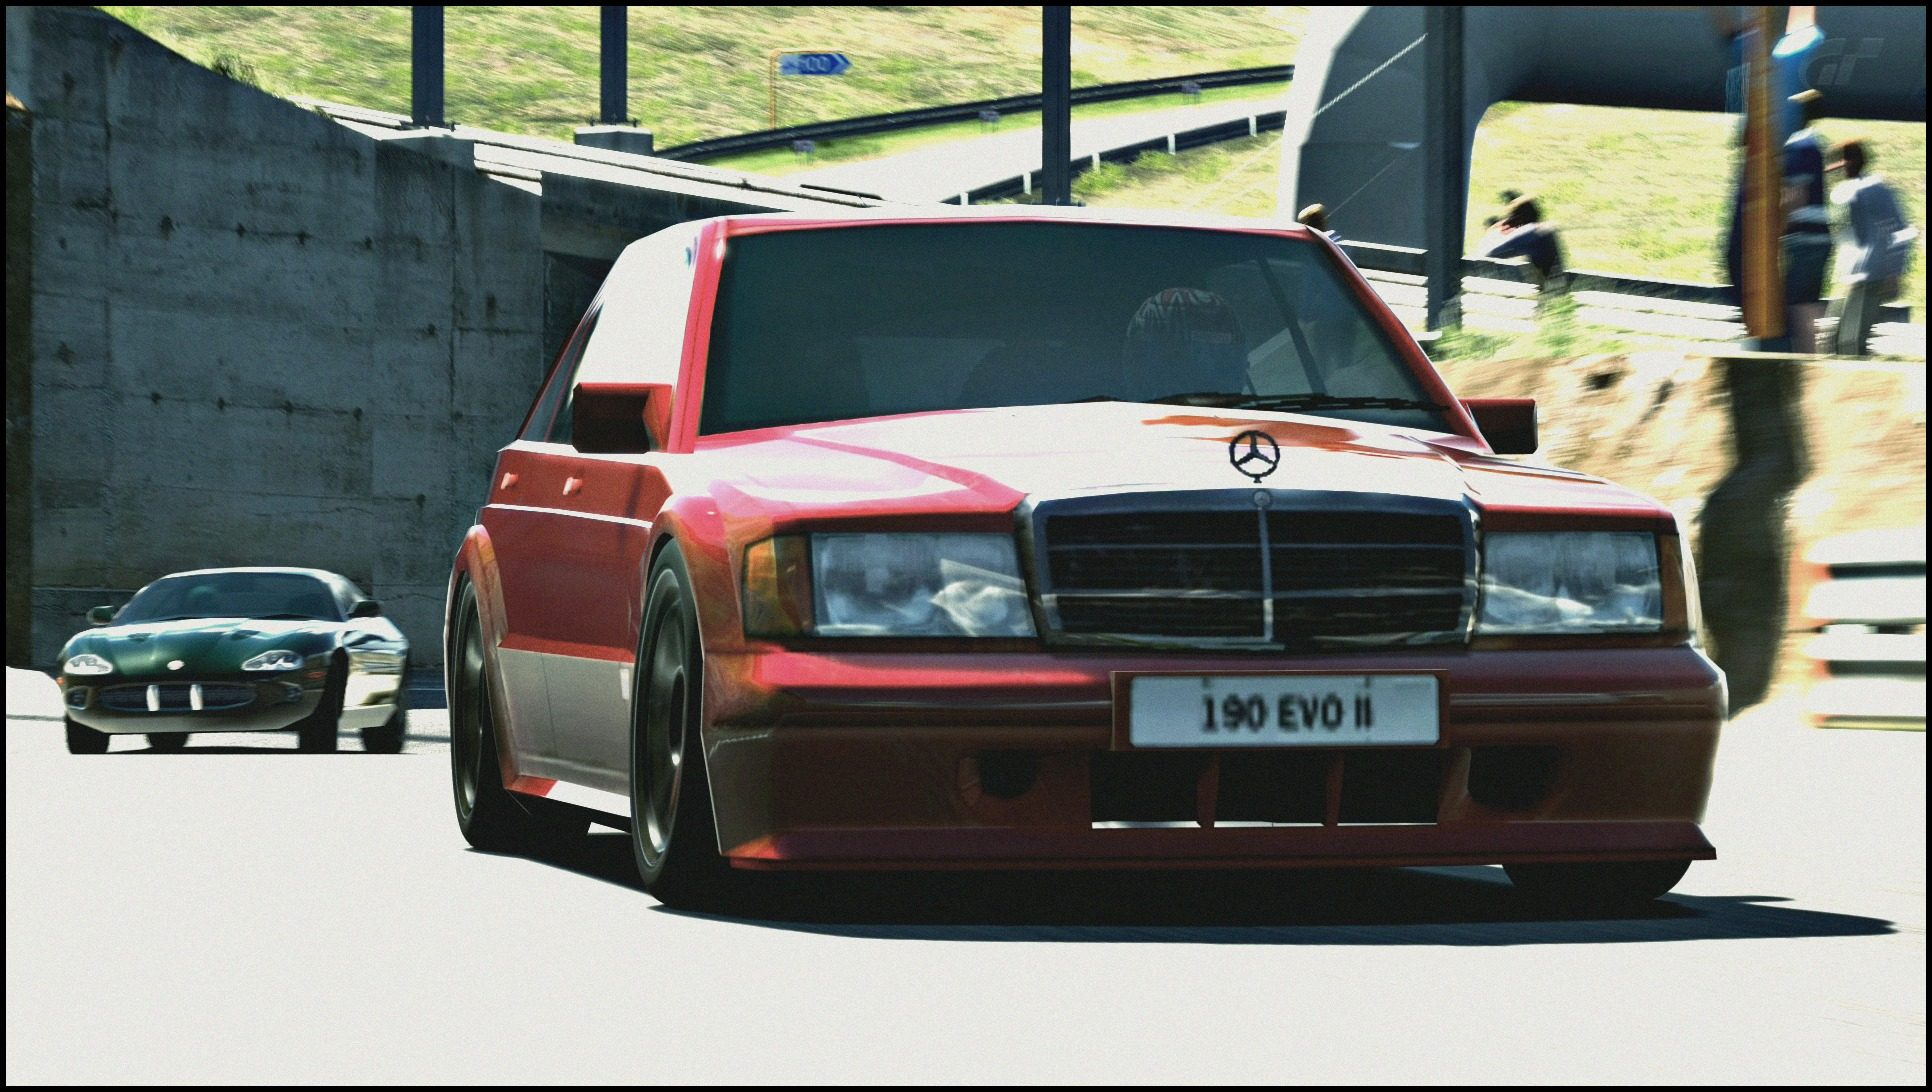 MattRott4-190Evo_Mercedes.jpg